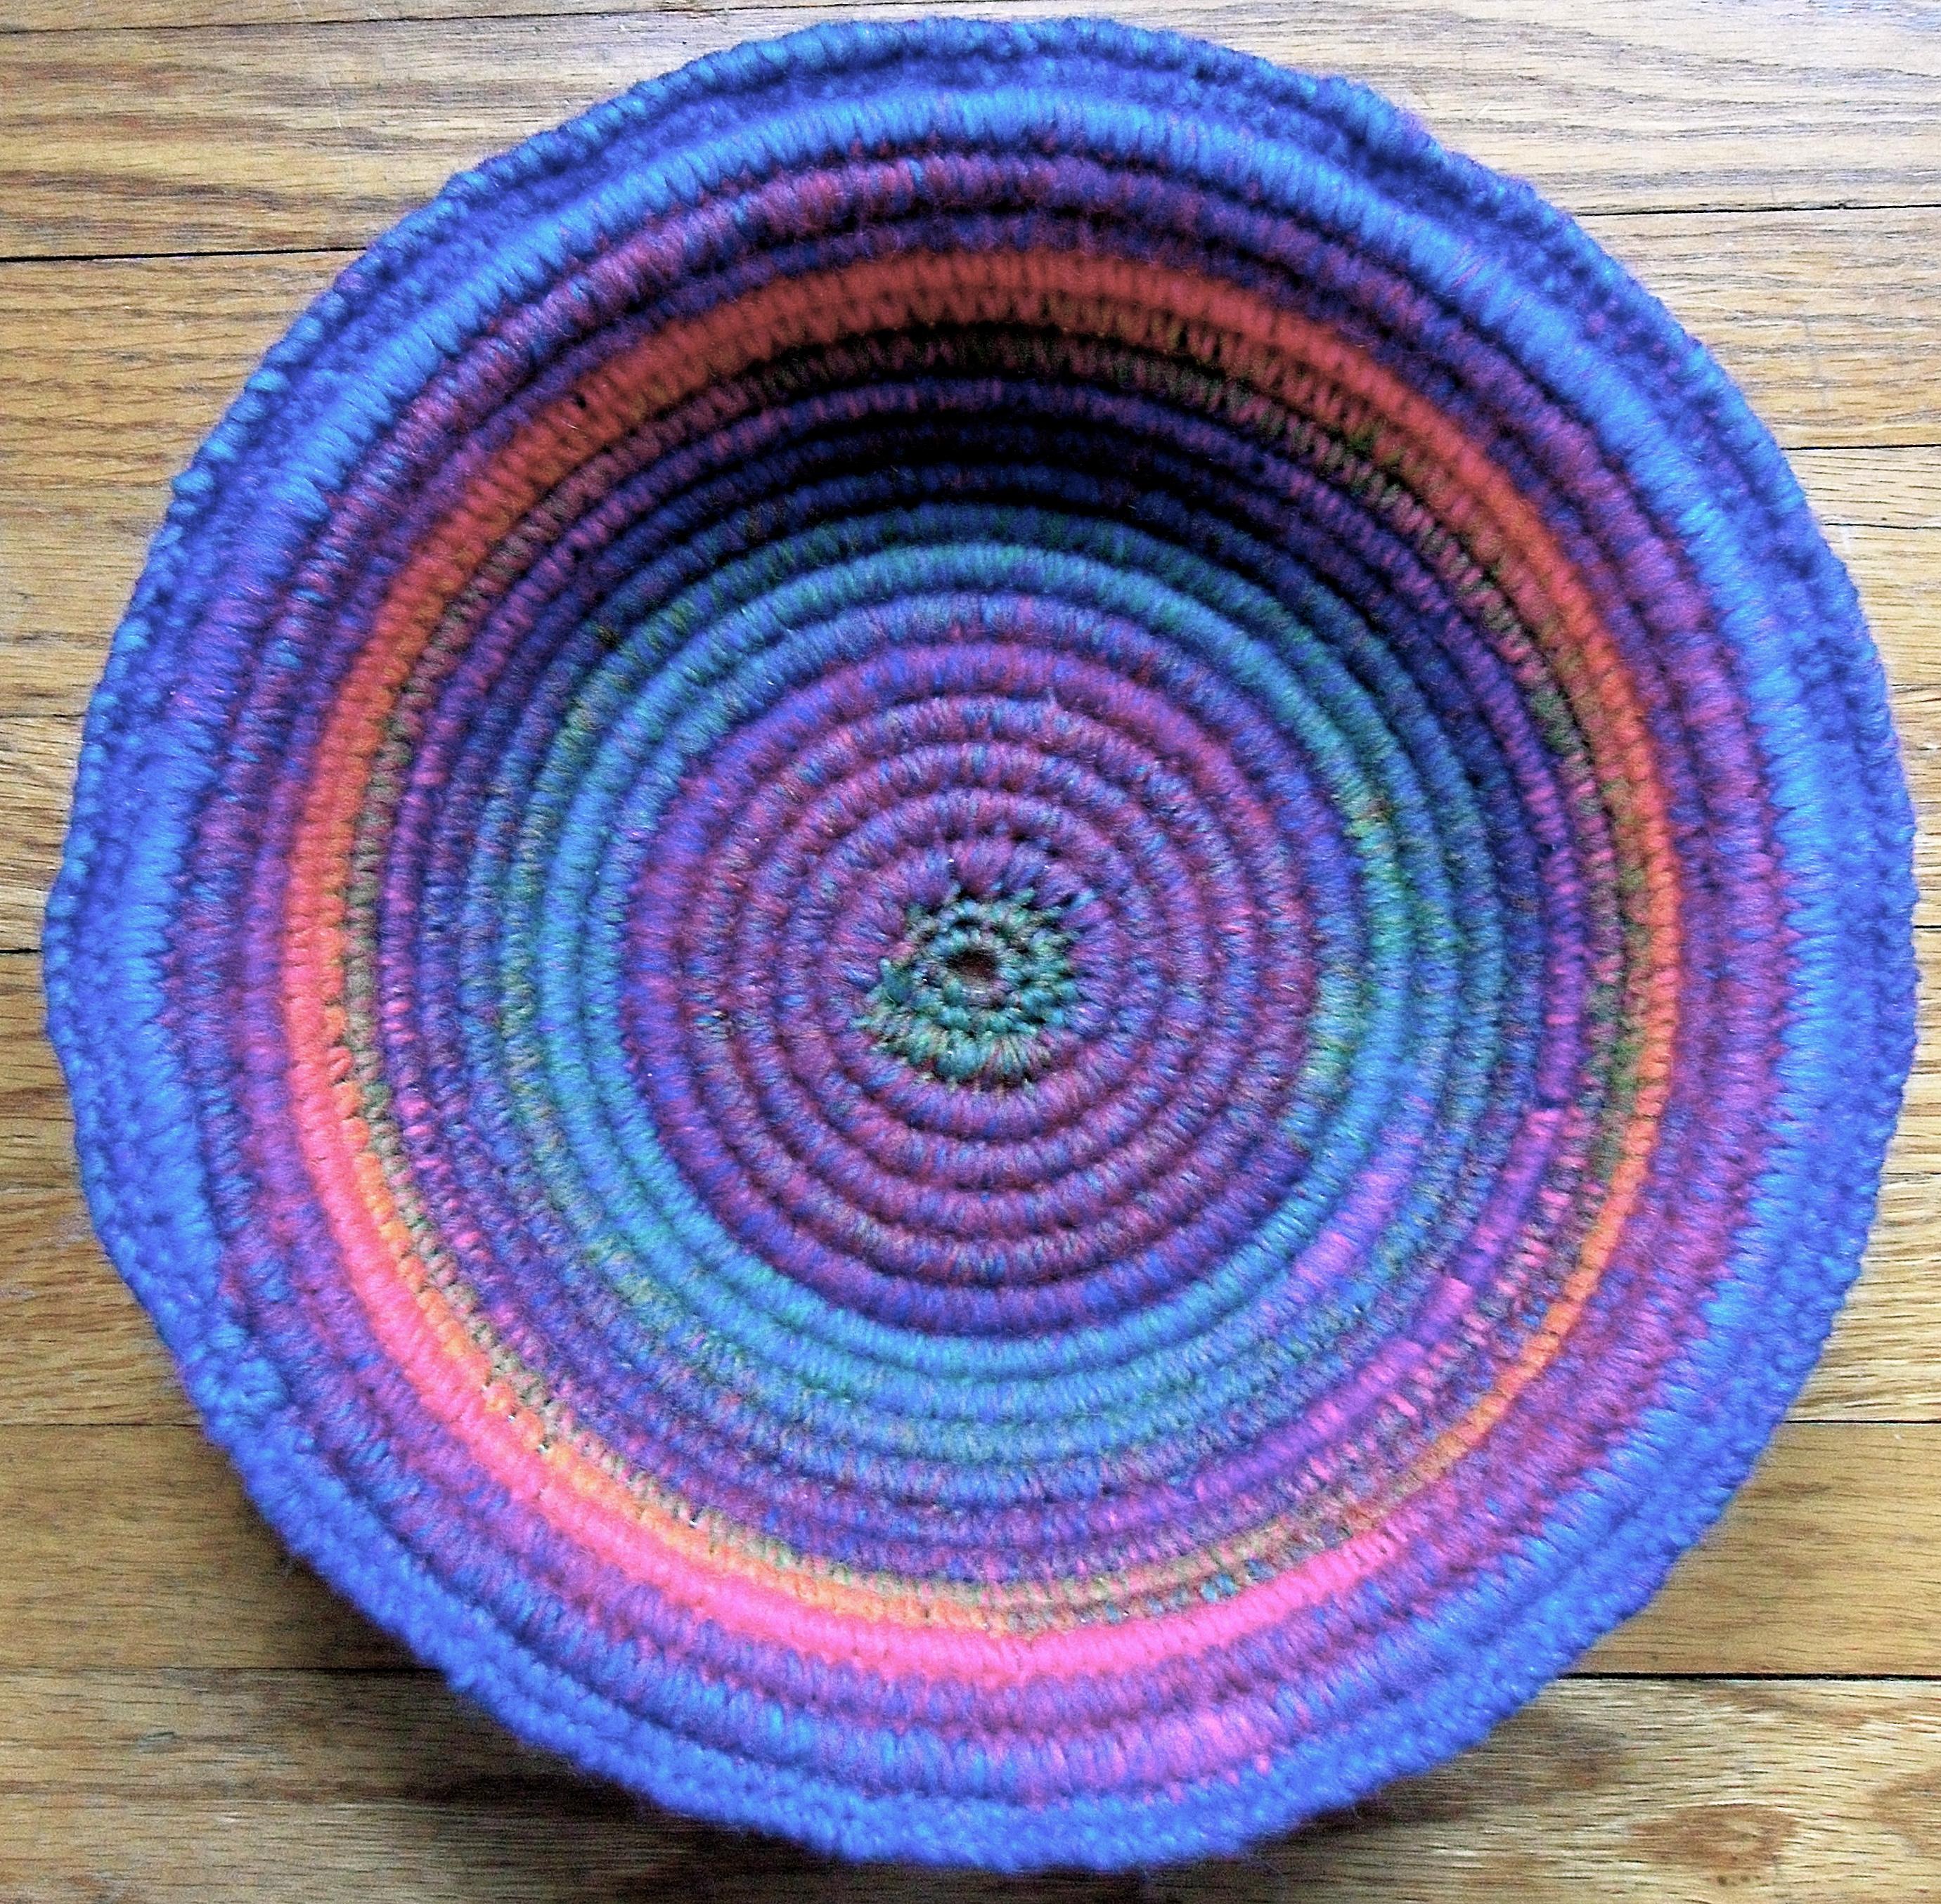 Crochet Coiled Basket Experiment Fiber Art Reflections